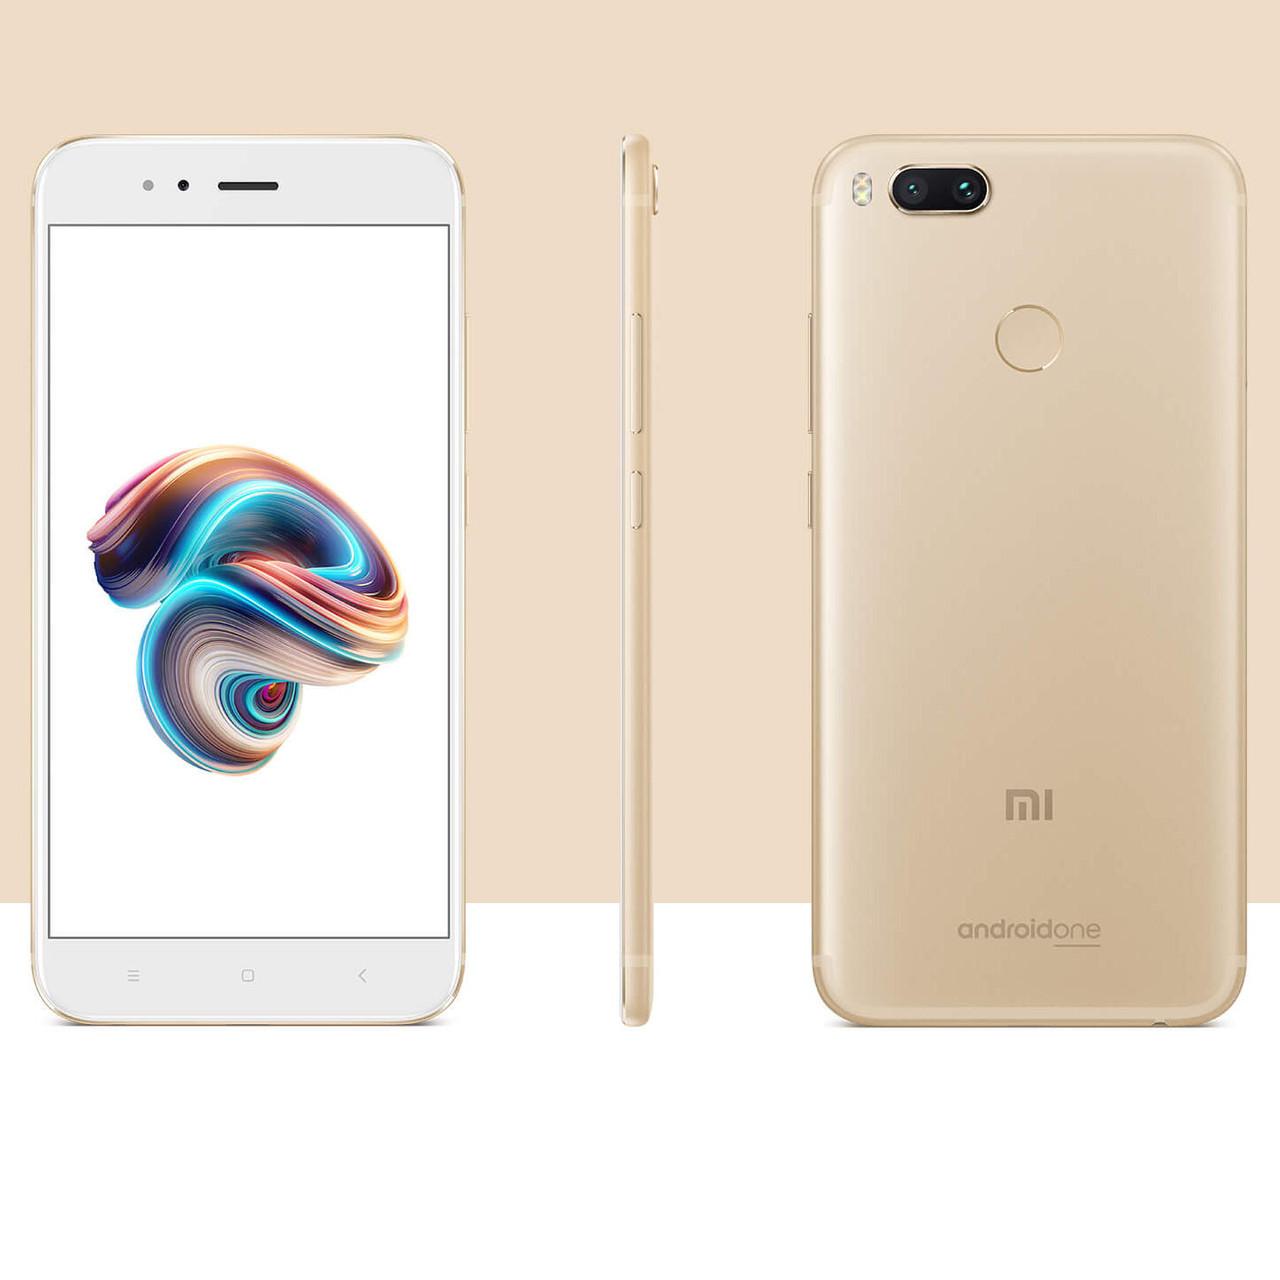 "Смартфон Xiaomi Mi A1 Gold, 4/64Gb, 12+13/5Мп, 8 ядер, 2sim, 5.5"" IPS, 3080mAh, GPS, 4G"